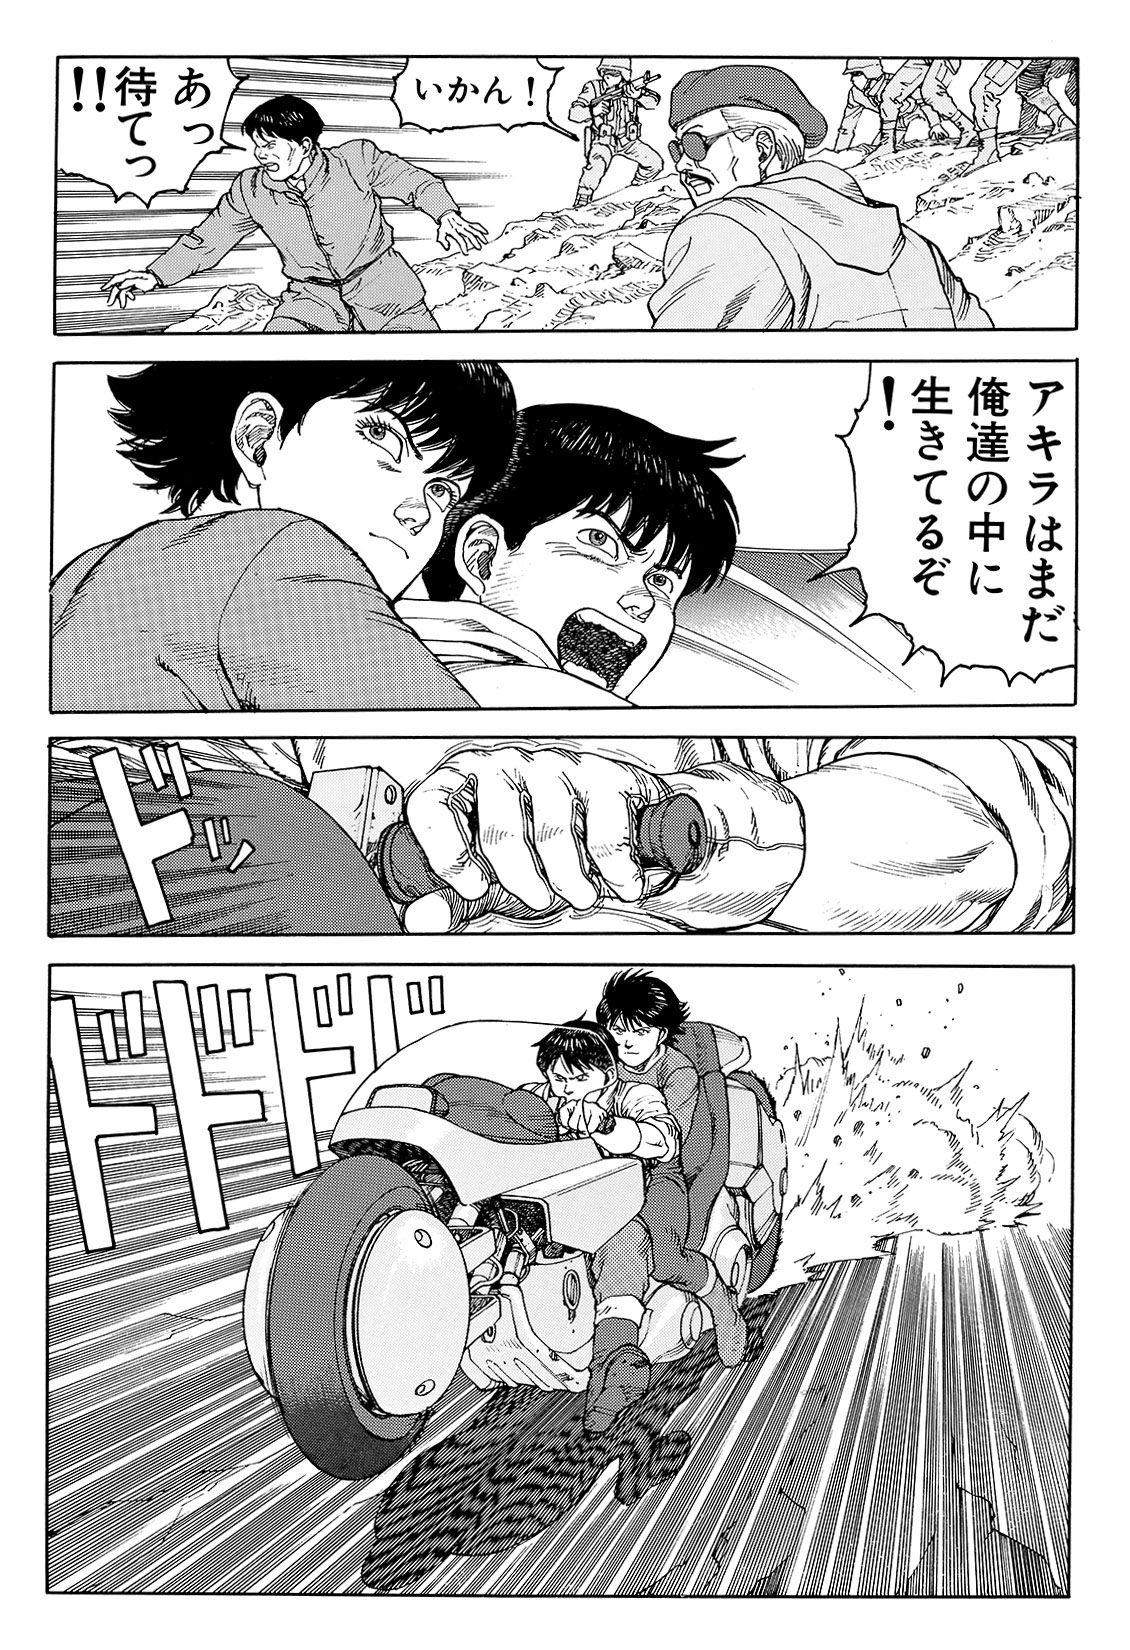 Katsuhiro Otomo On Creating Akira And Designing The Coolest Bike In All Of Manga And Anime Akira Manga Akira Anime Katsuhiro Otomo